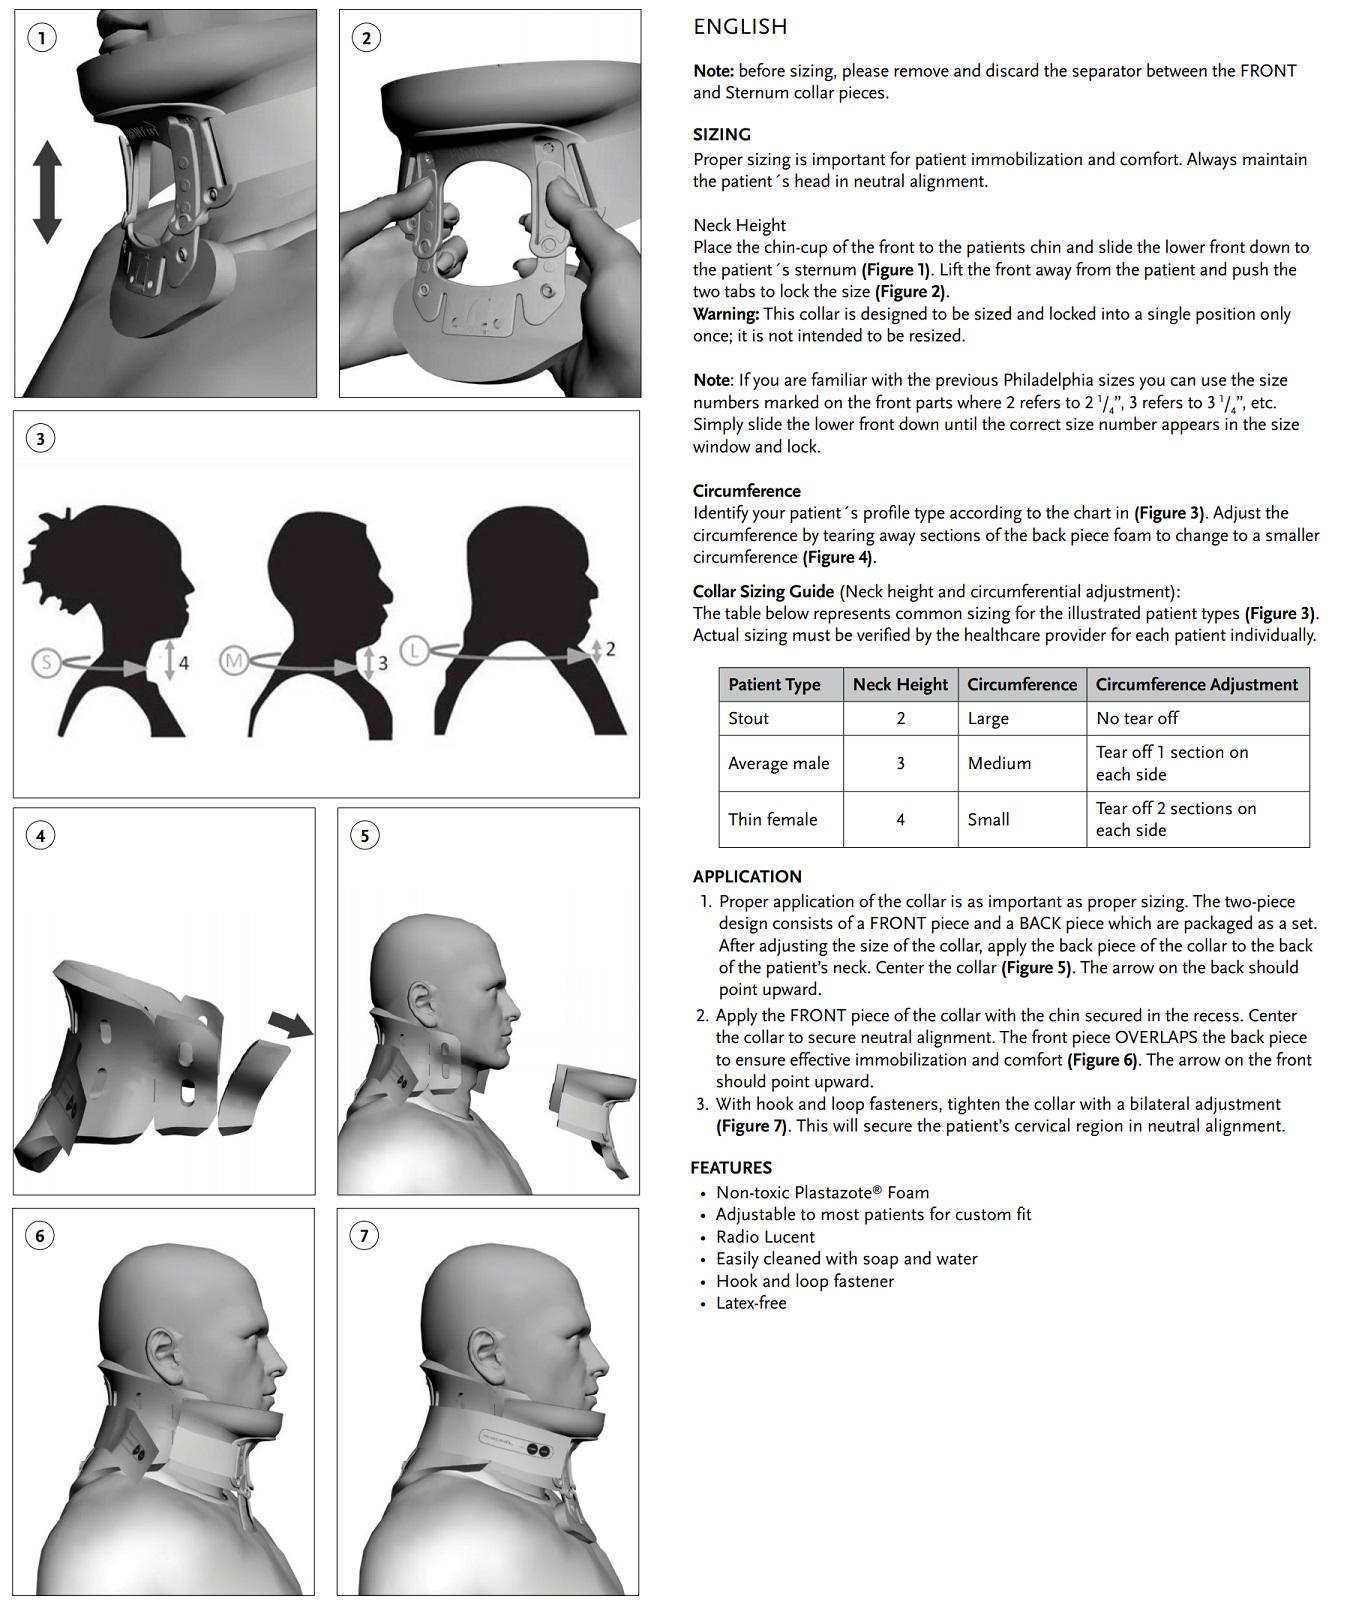 Philadelphia Instructions